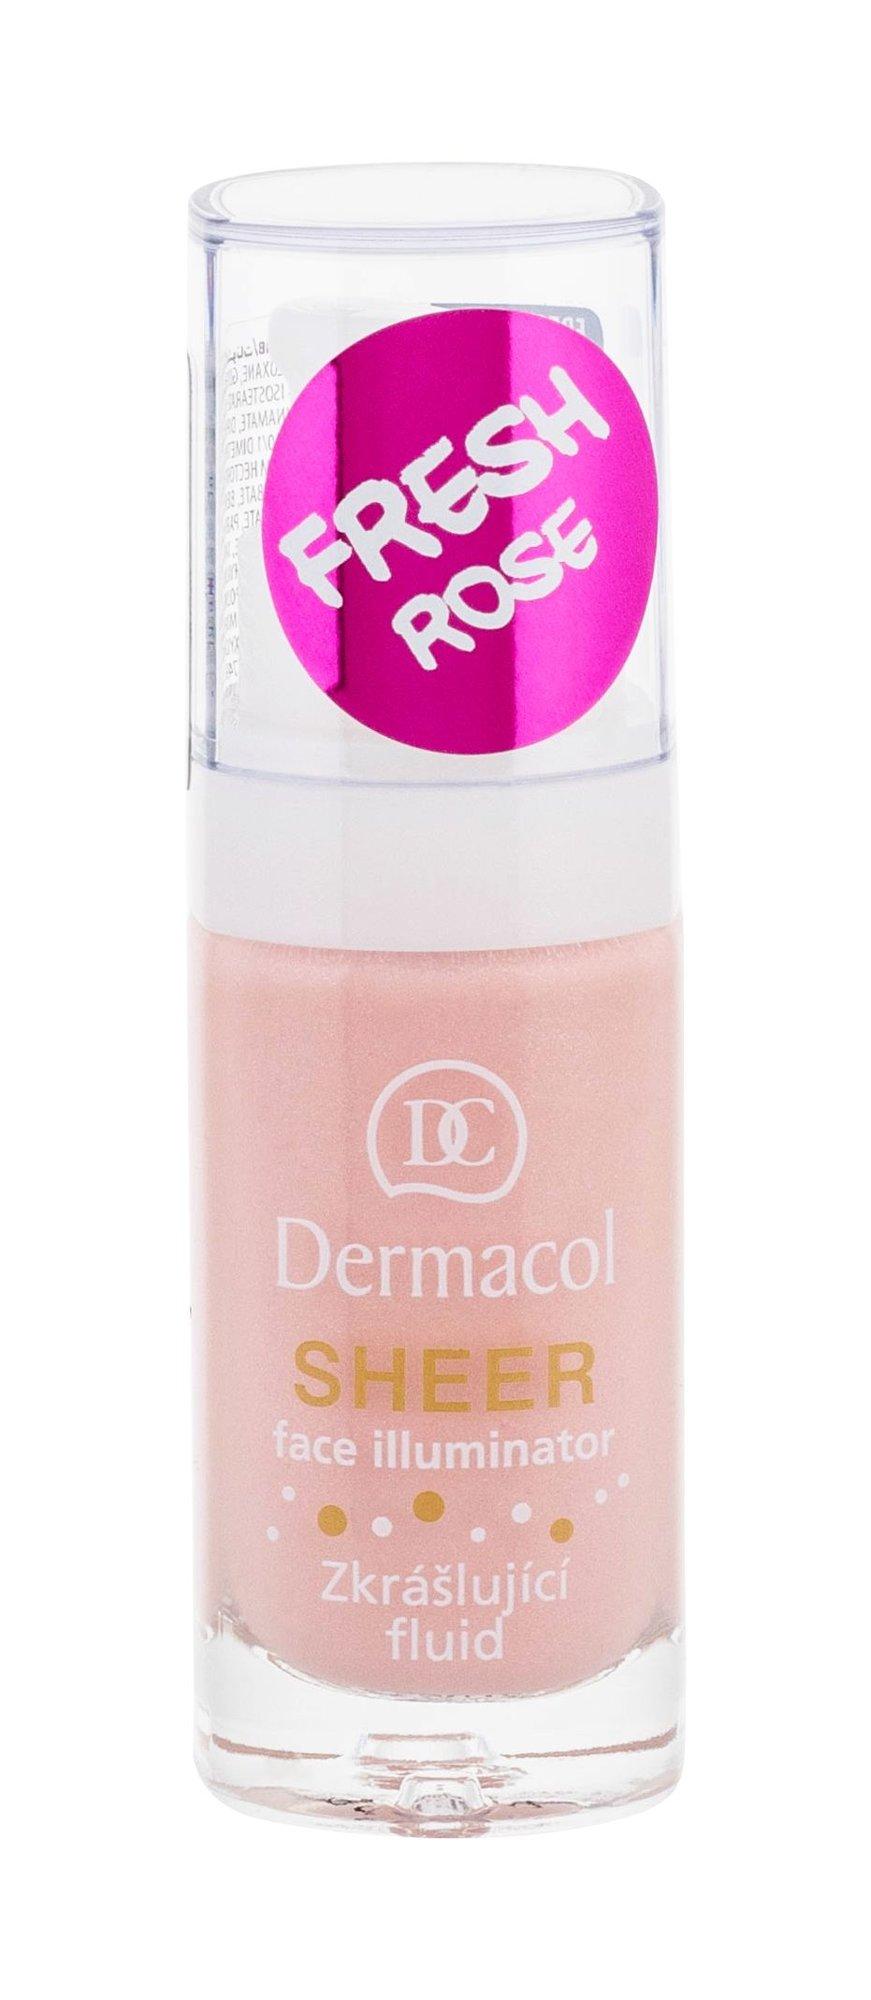 Dermacol Sheer Makeup Primer 15ml fresh rose